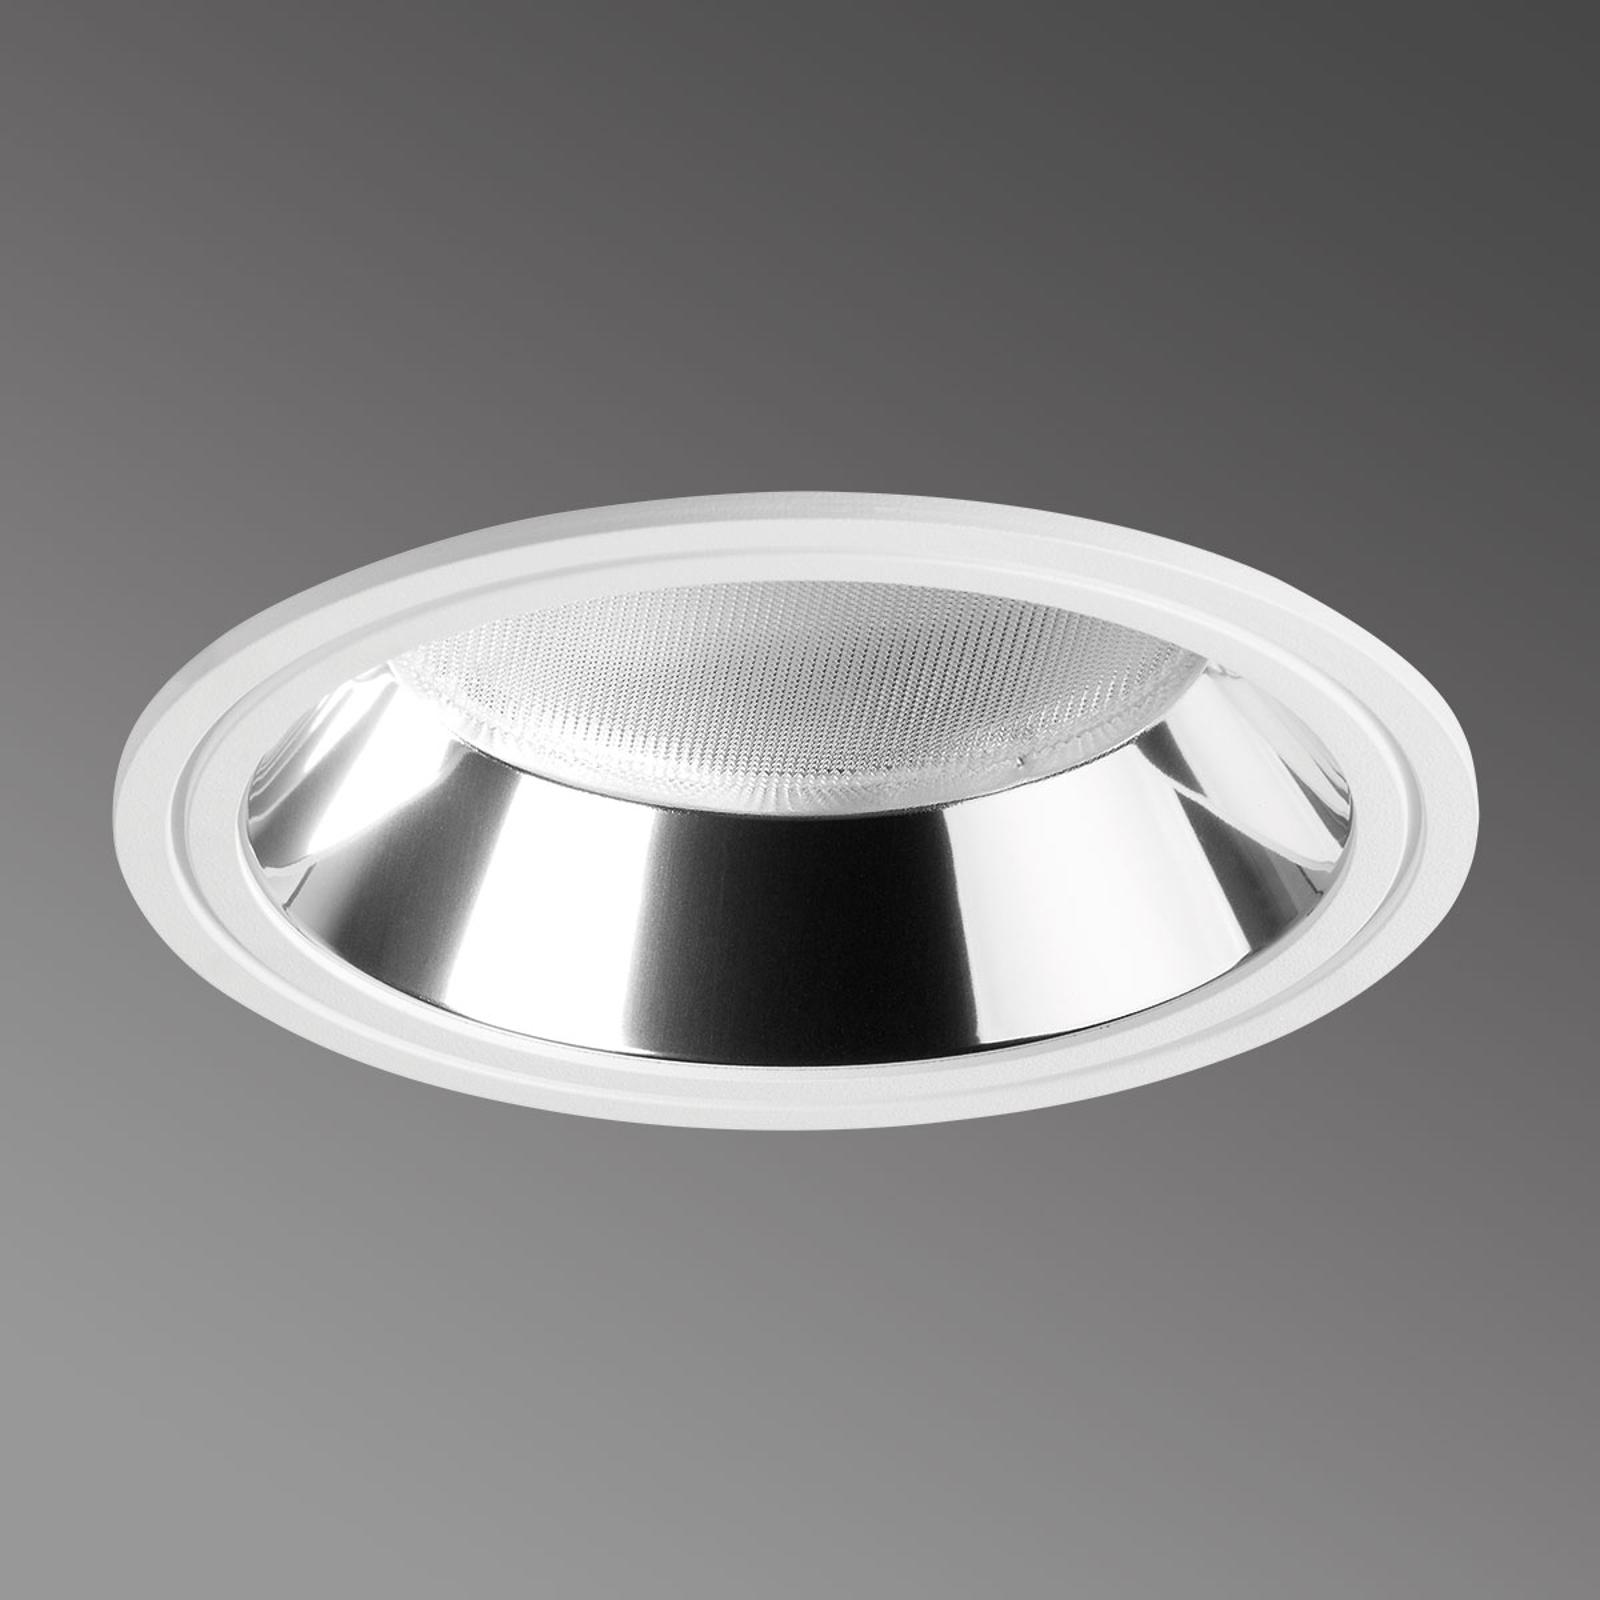 Prettus M PRE LED inbouwspot, 72°, 29W, 3.000 K